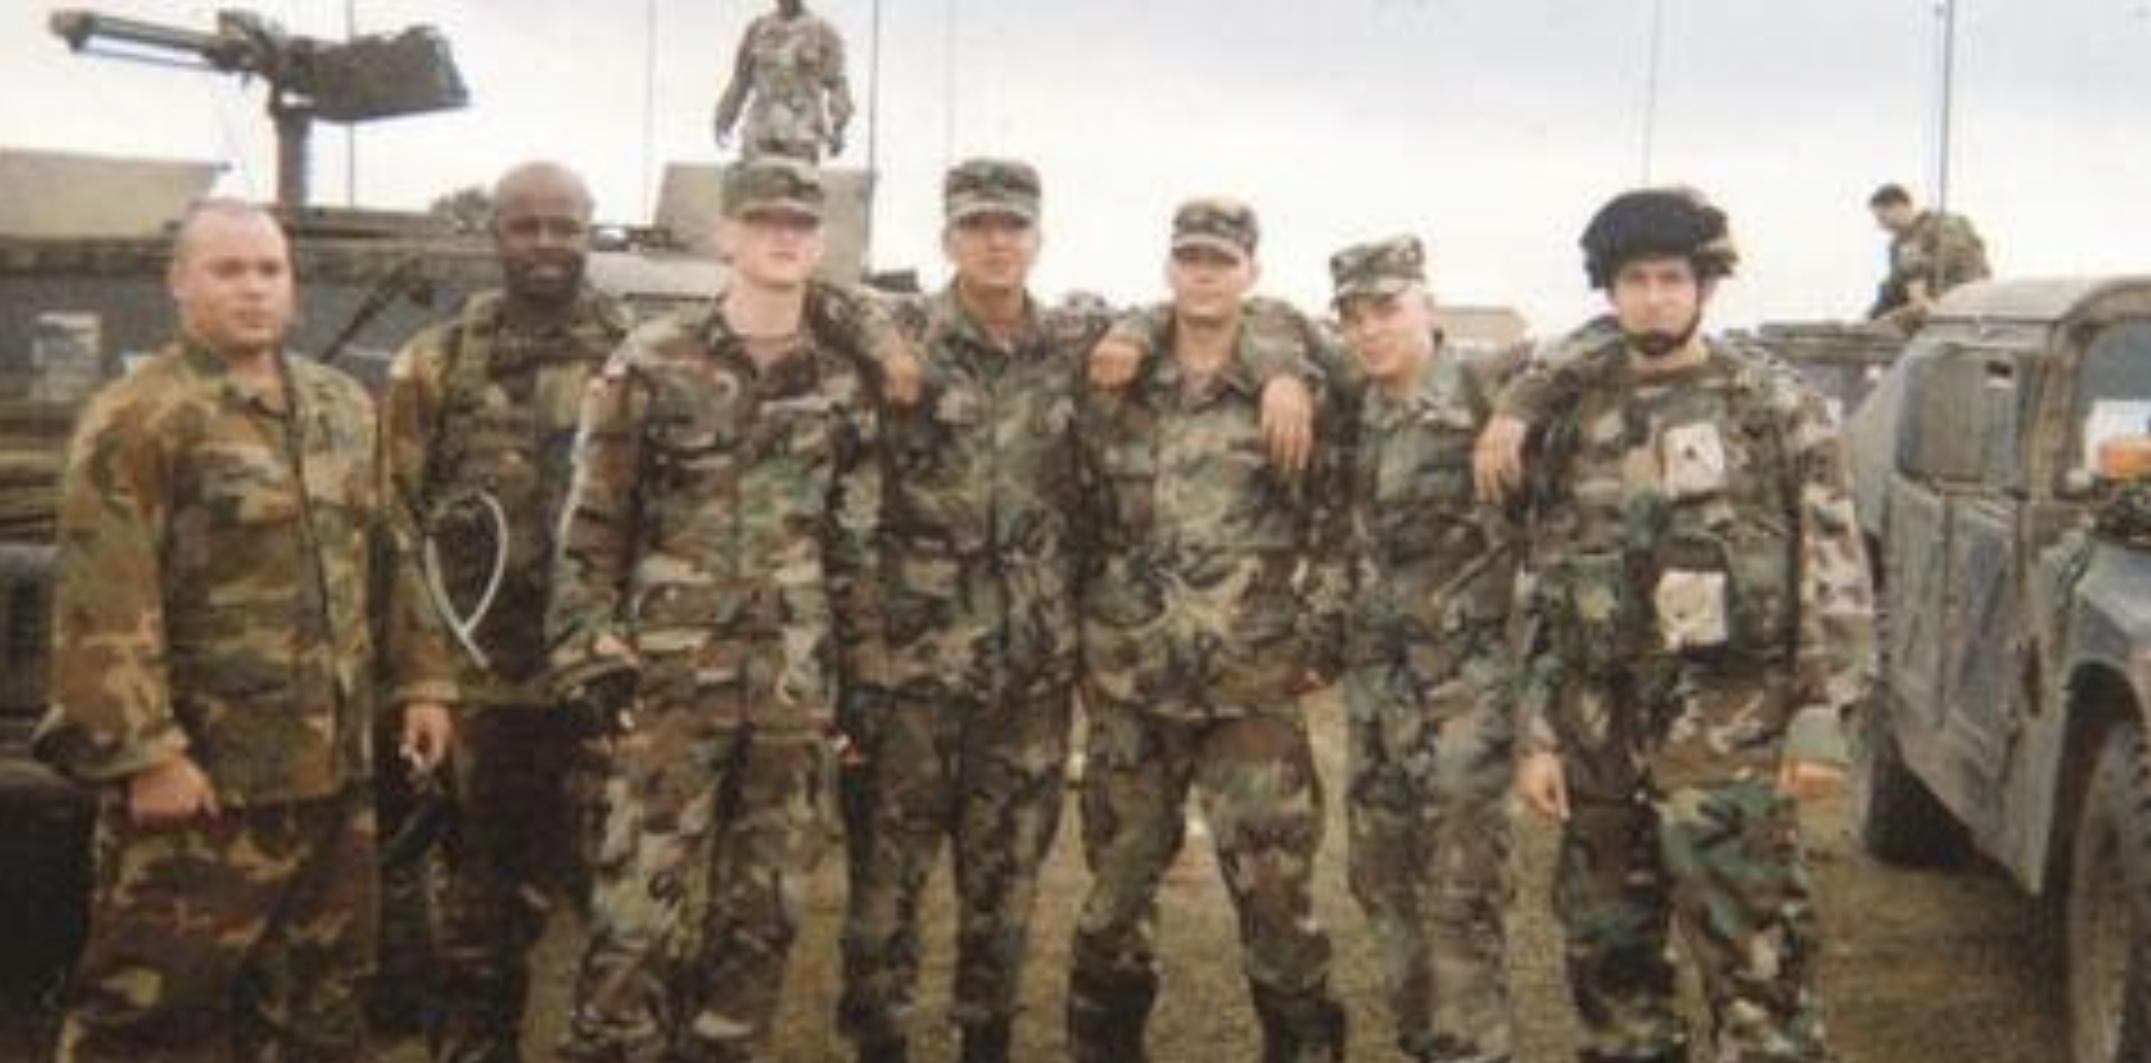 Adam Mattis in the US Army